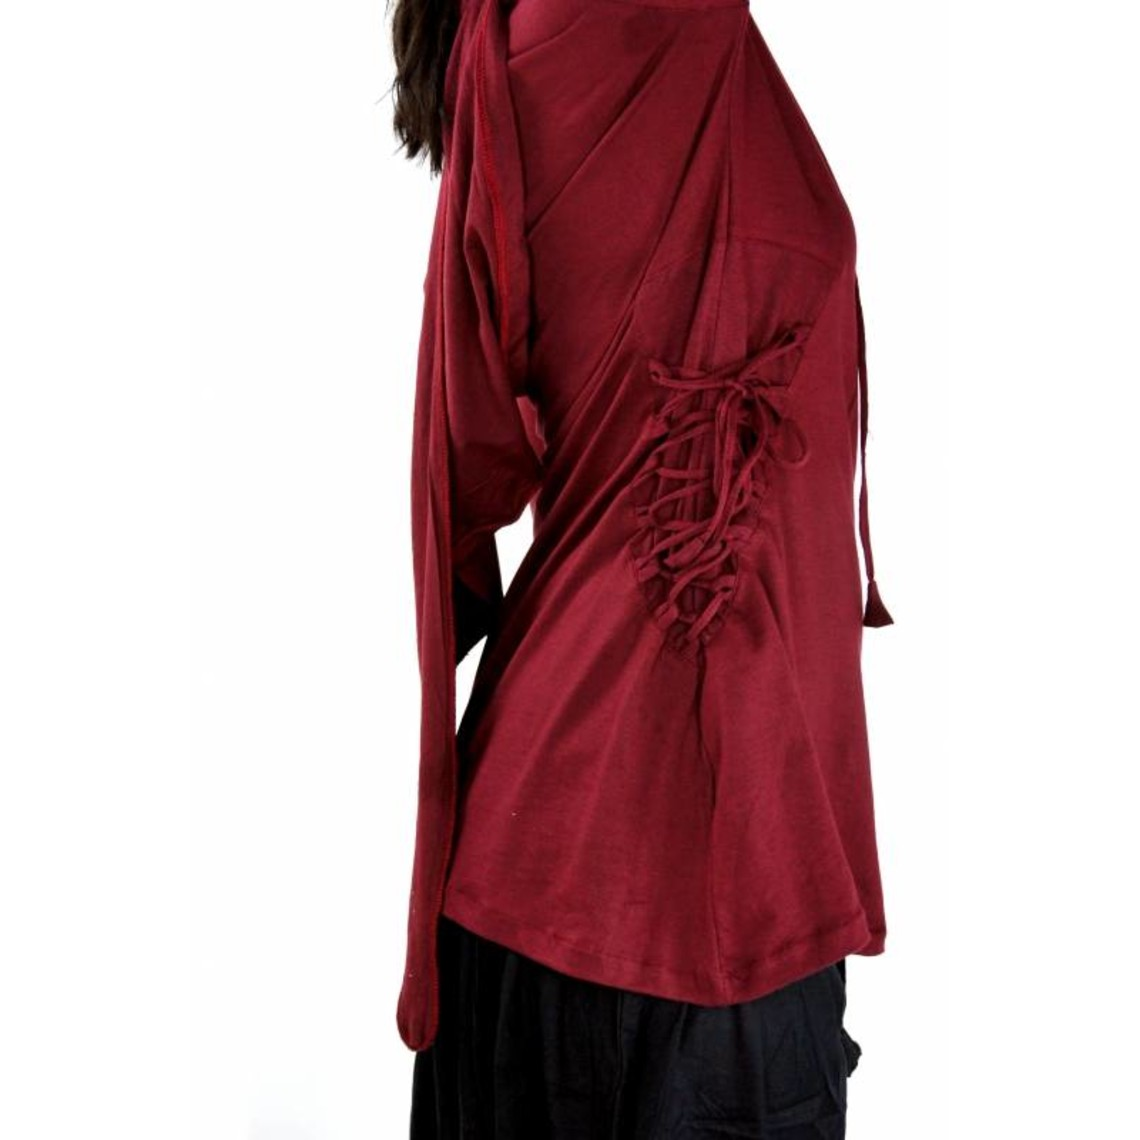 Leonardo Carbone Túnica de mujer Lea rojo